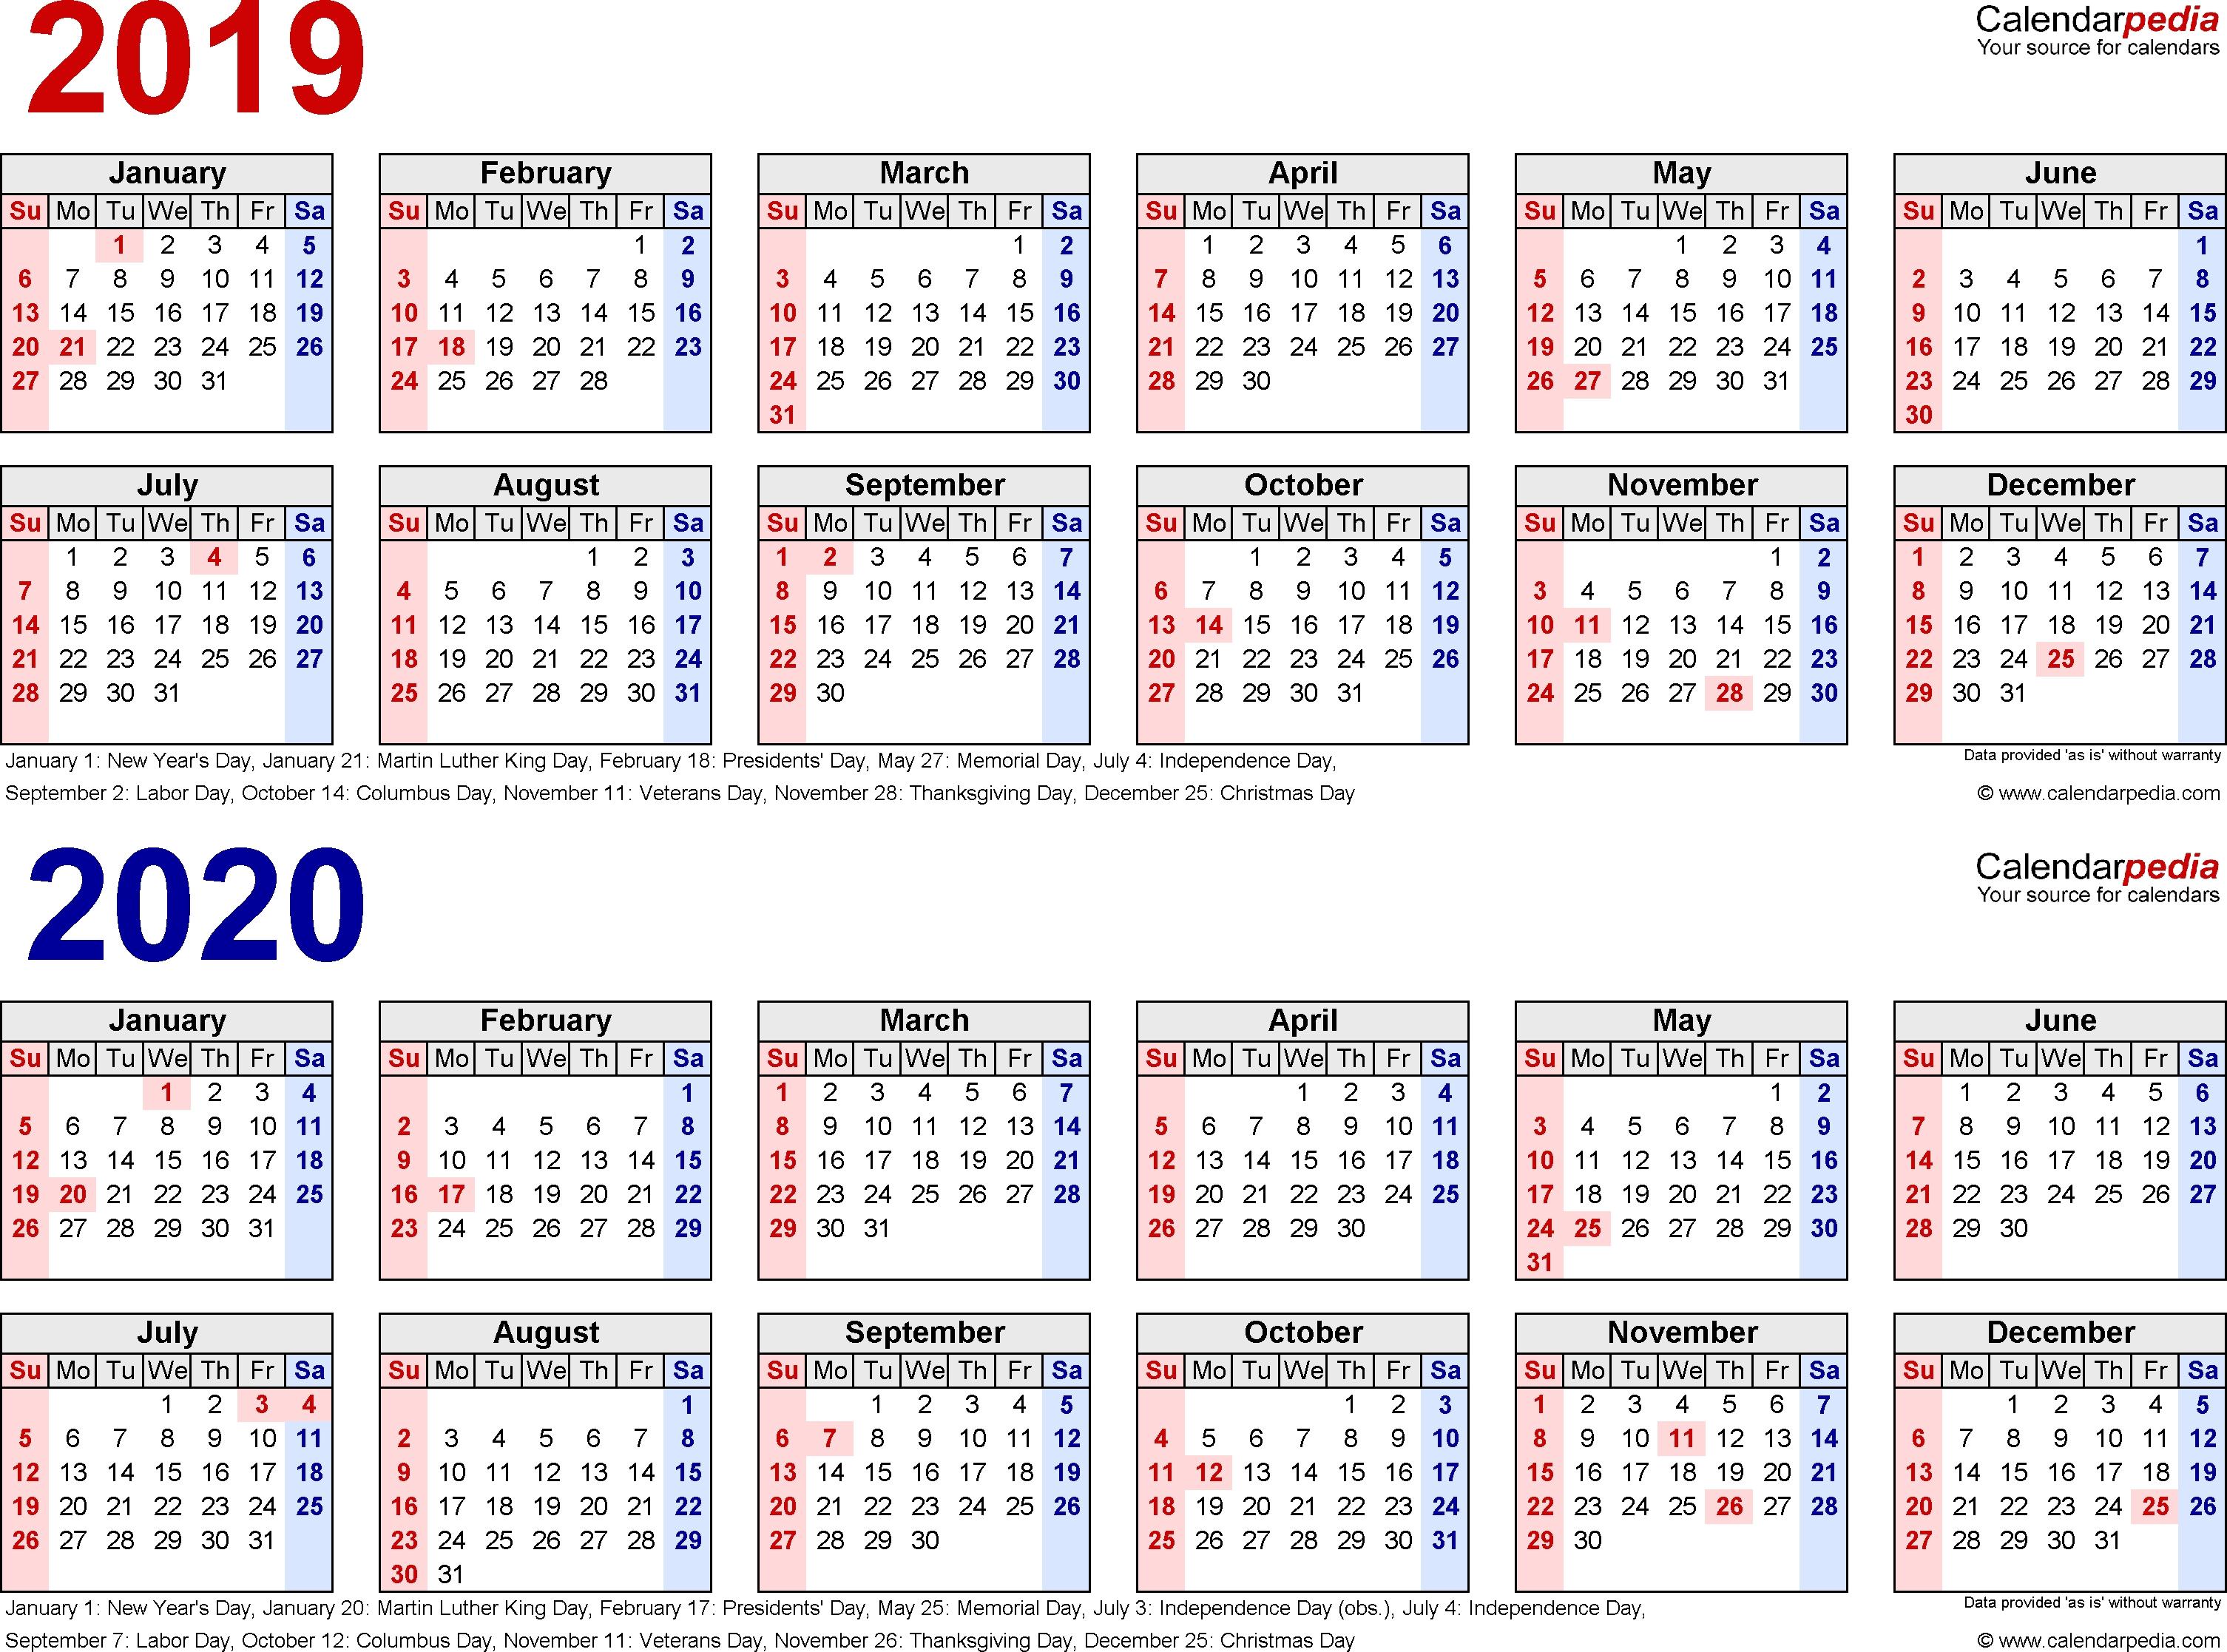 2019-2020 Calendar - Free Printable Two-Year Word Calendars throughout Free Printable Calendar July 2019-June 2020